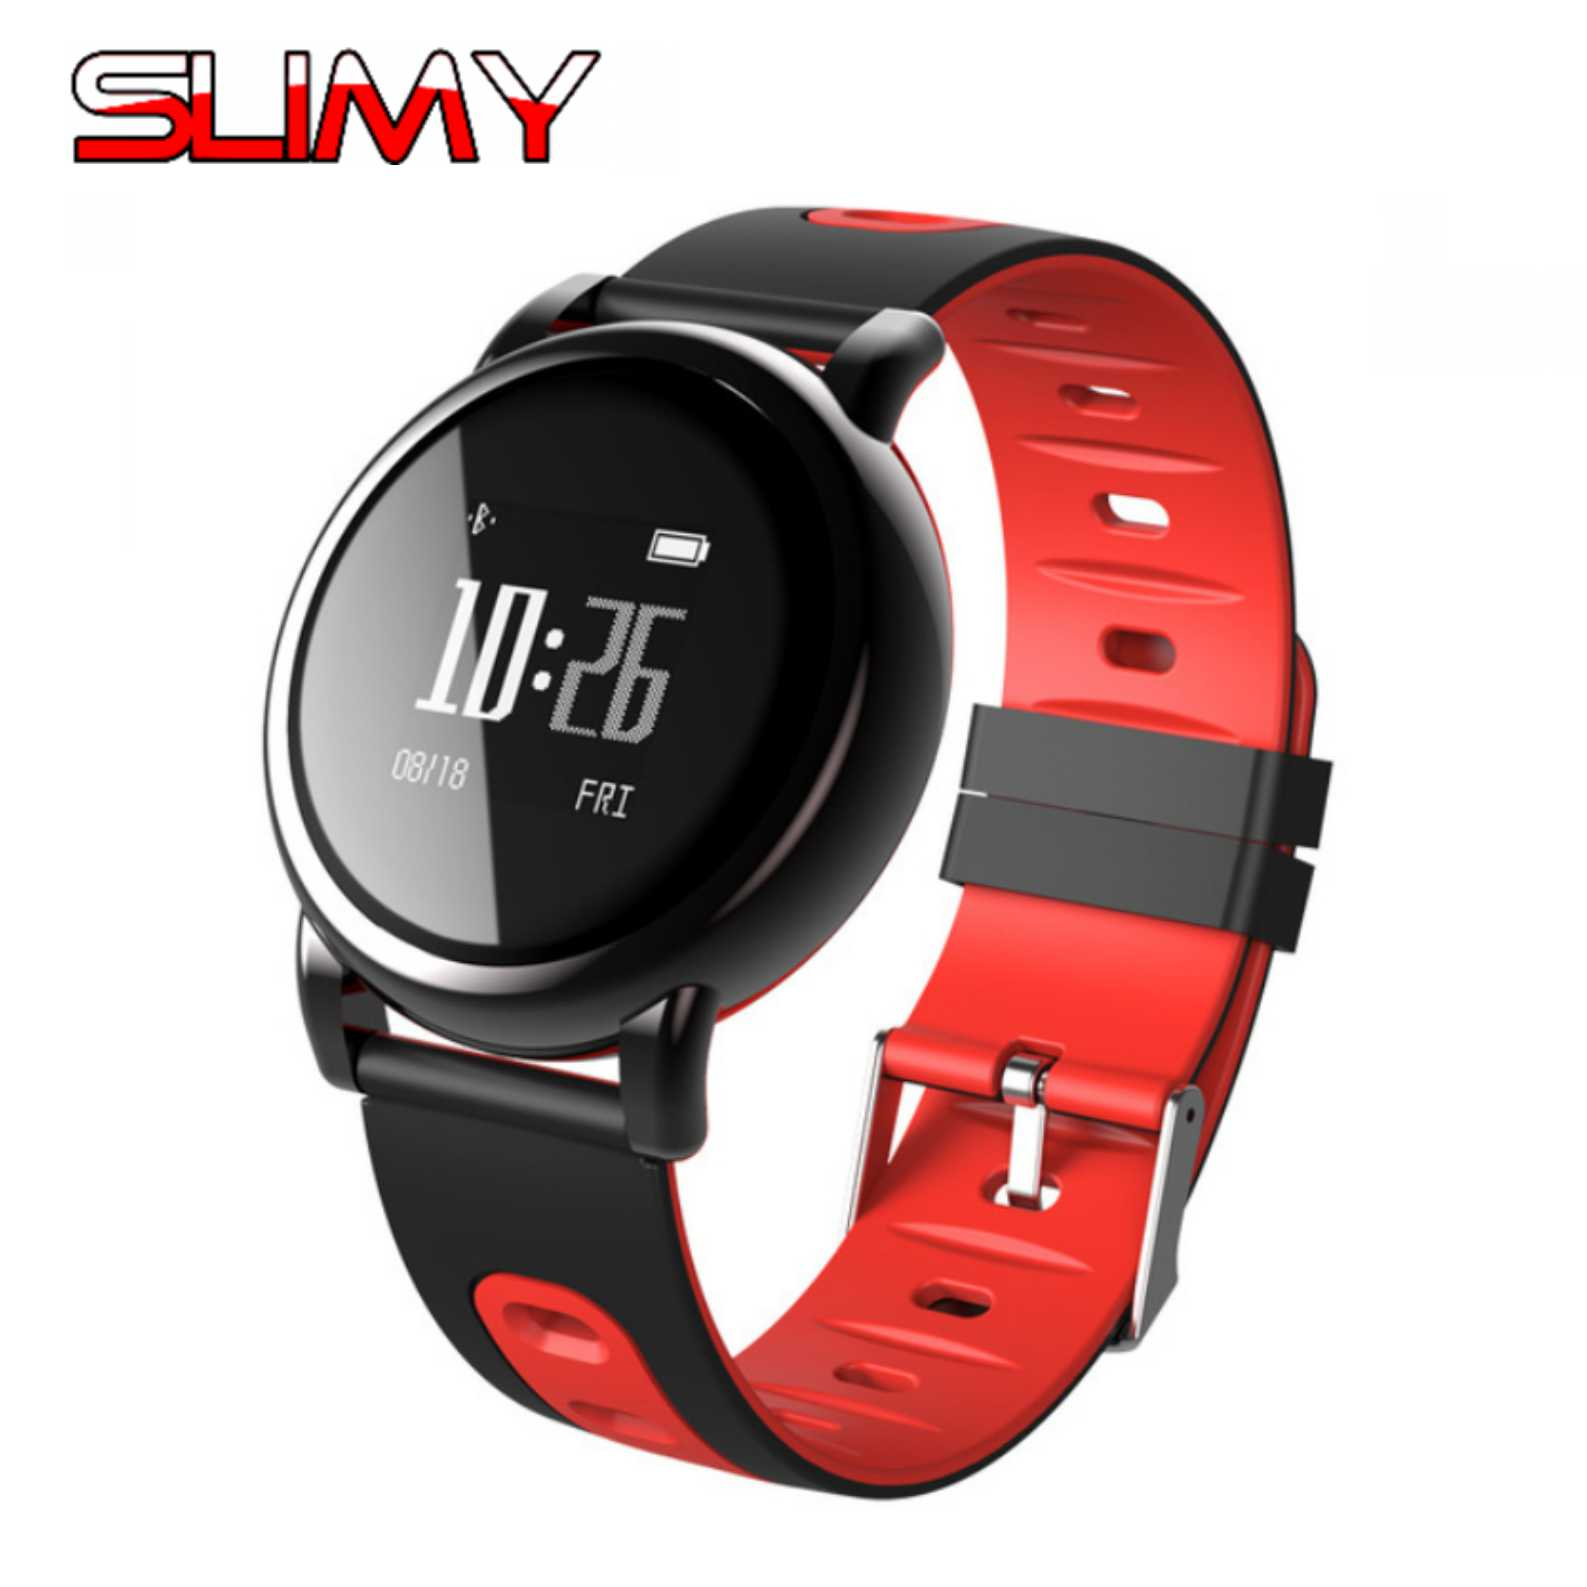 Dm98 Smart Watch Strap Silicone Wrist Band Strap Metal Buckle